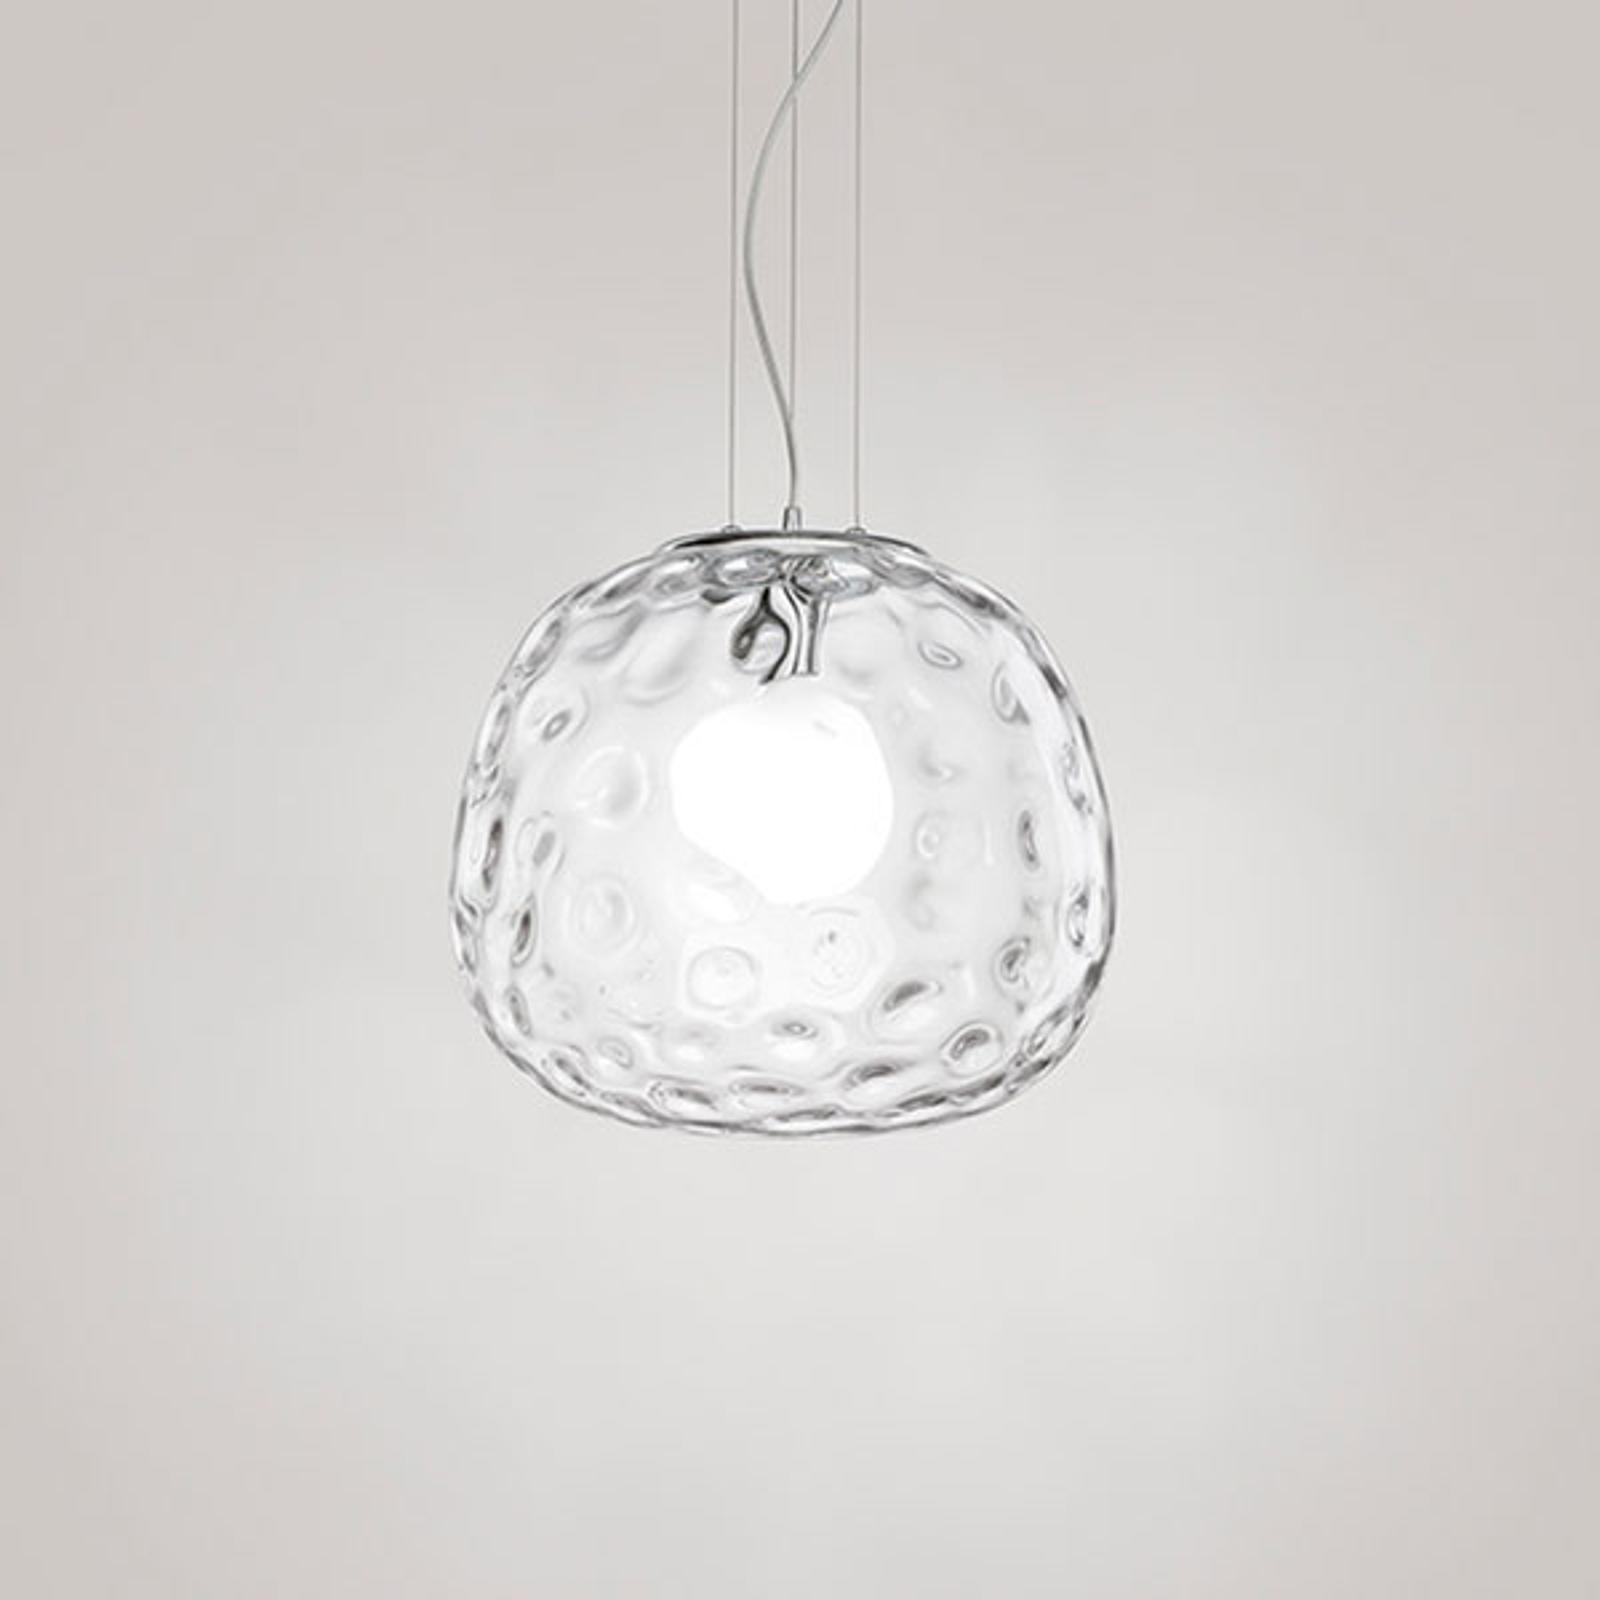 Hanglamp 6468 met transparante glas Ø 40 cm